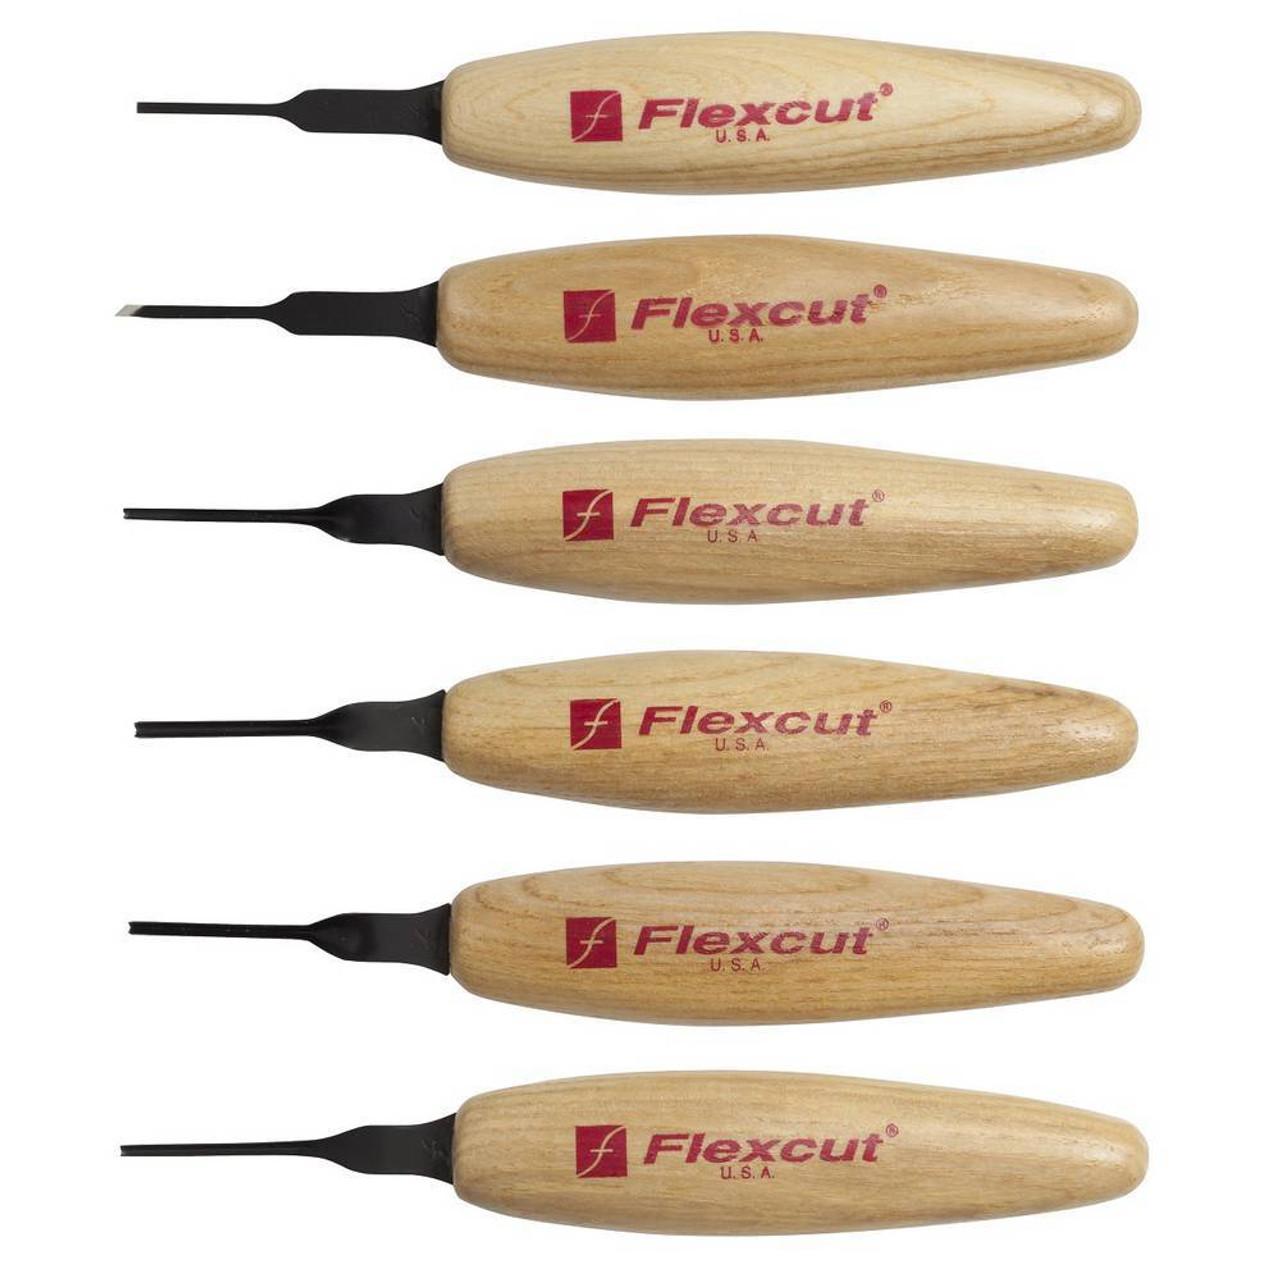 "Flexcut MT910 Mixed Profile Micro Tool Set, showing six different 1.5mm Micro Tools. MT11 1/16"" (1.5mm) Chisel, MT15 1/16"" (1.5mm) Micro Skew, MT19 1.5mm Micro Sweep, MT27 1.5mm Micro Deep U-Gouge, MT31 1.5mm 45° Micro Parting Tool, MT39 1.5mm 90° Micro Parting Tool."